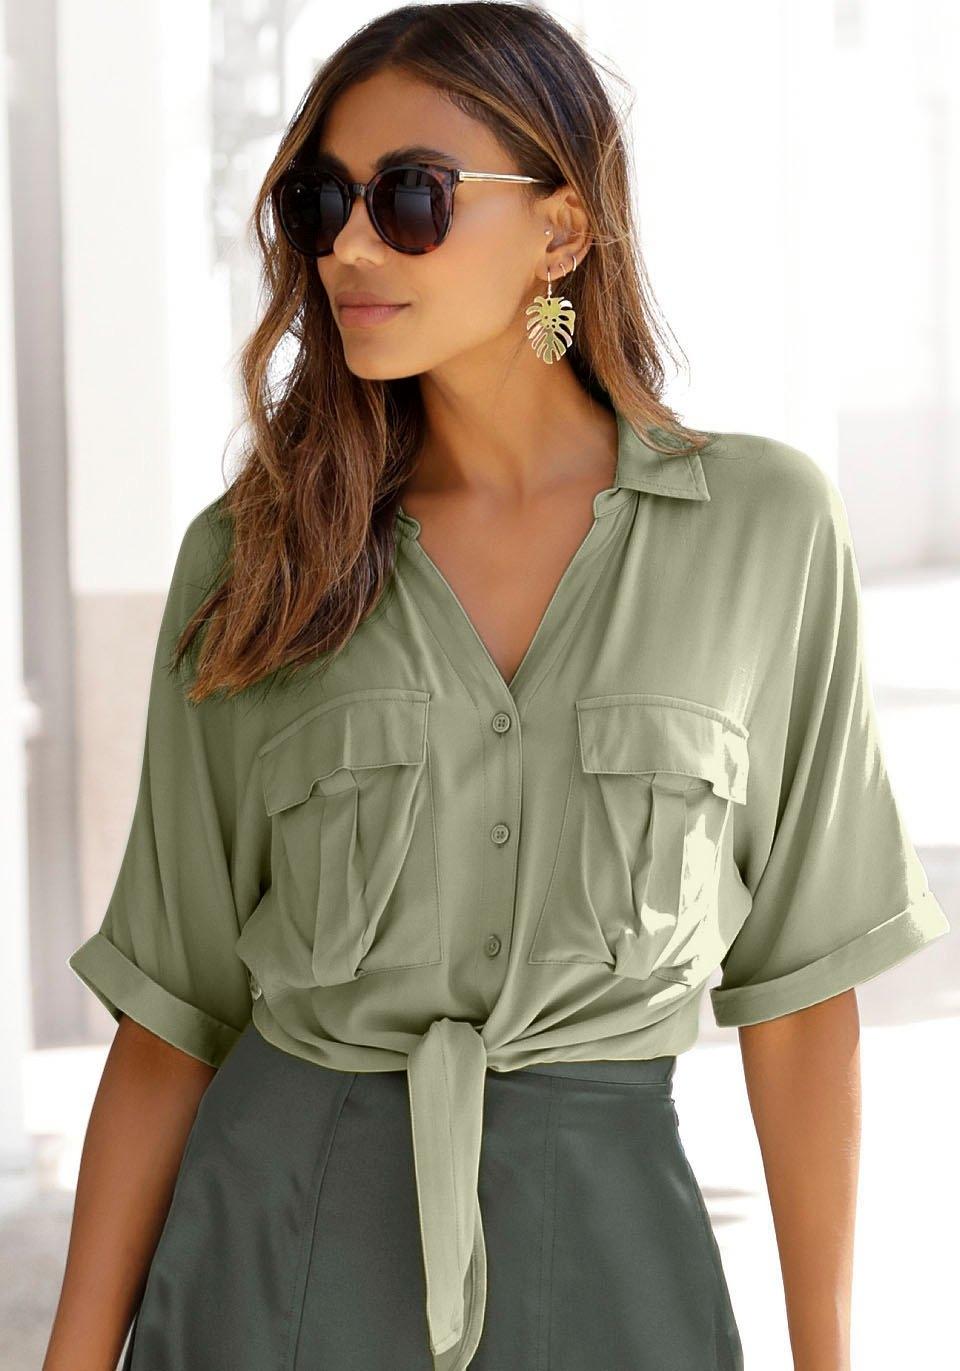 Lascana blouse met korte mouwen met knoopdetail goedkoop op otto.nl kopen